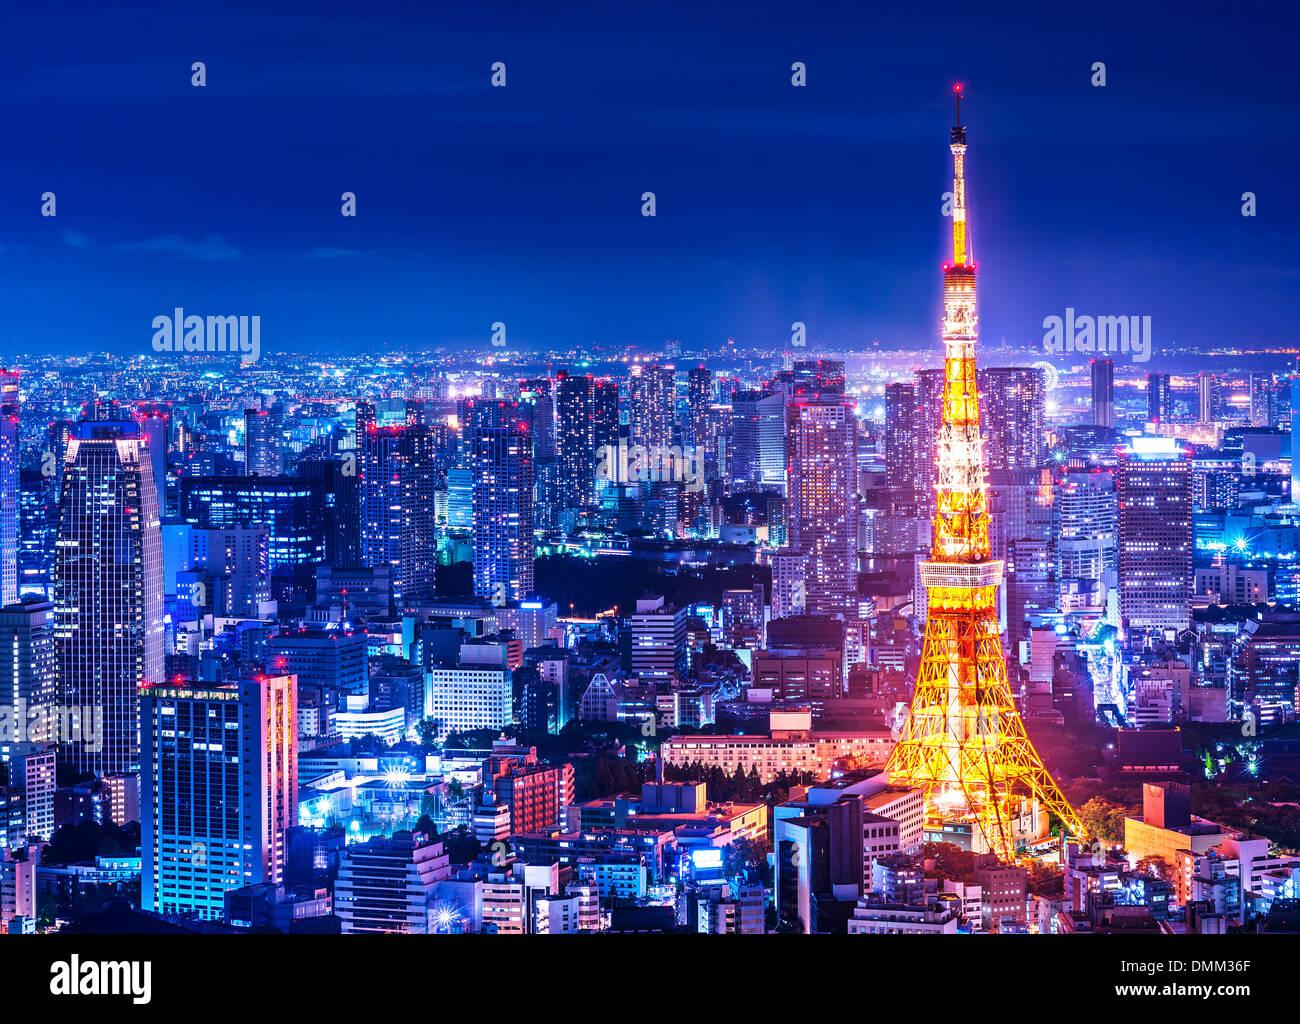 Tokyo Tower in Tokyo, Japan. - Stock Image